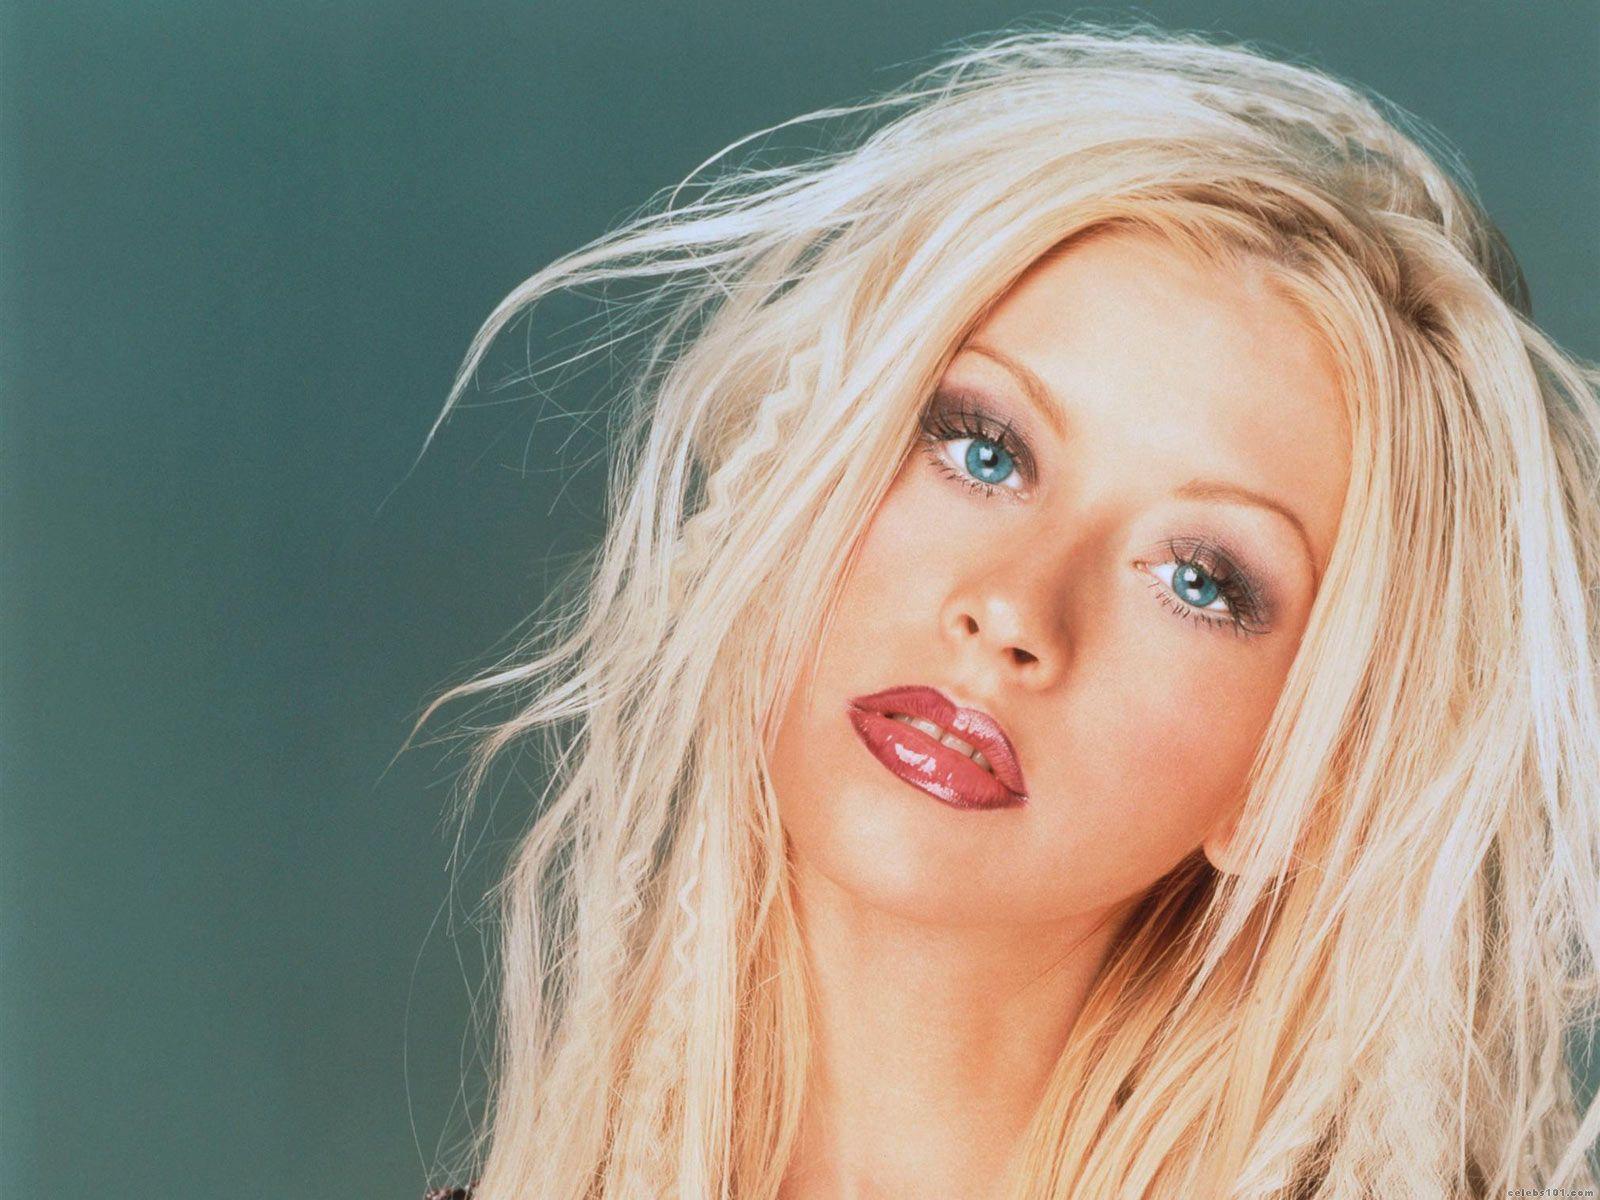 Christina Aguilera Wallpaper 1600x1200